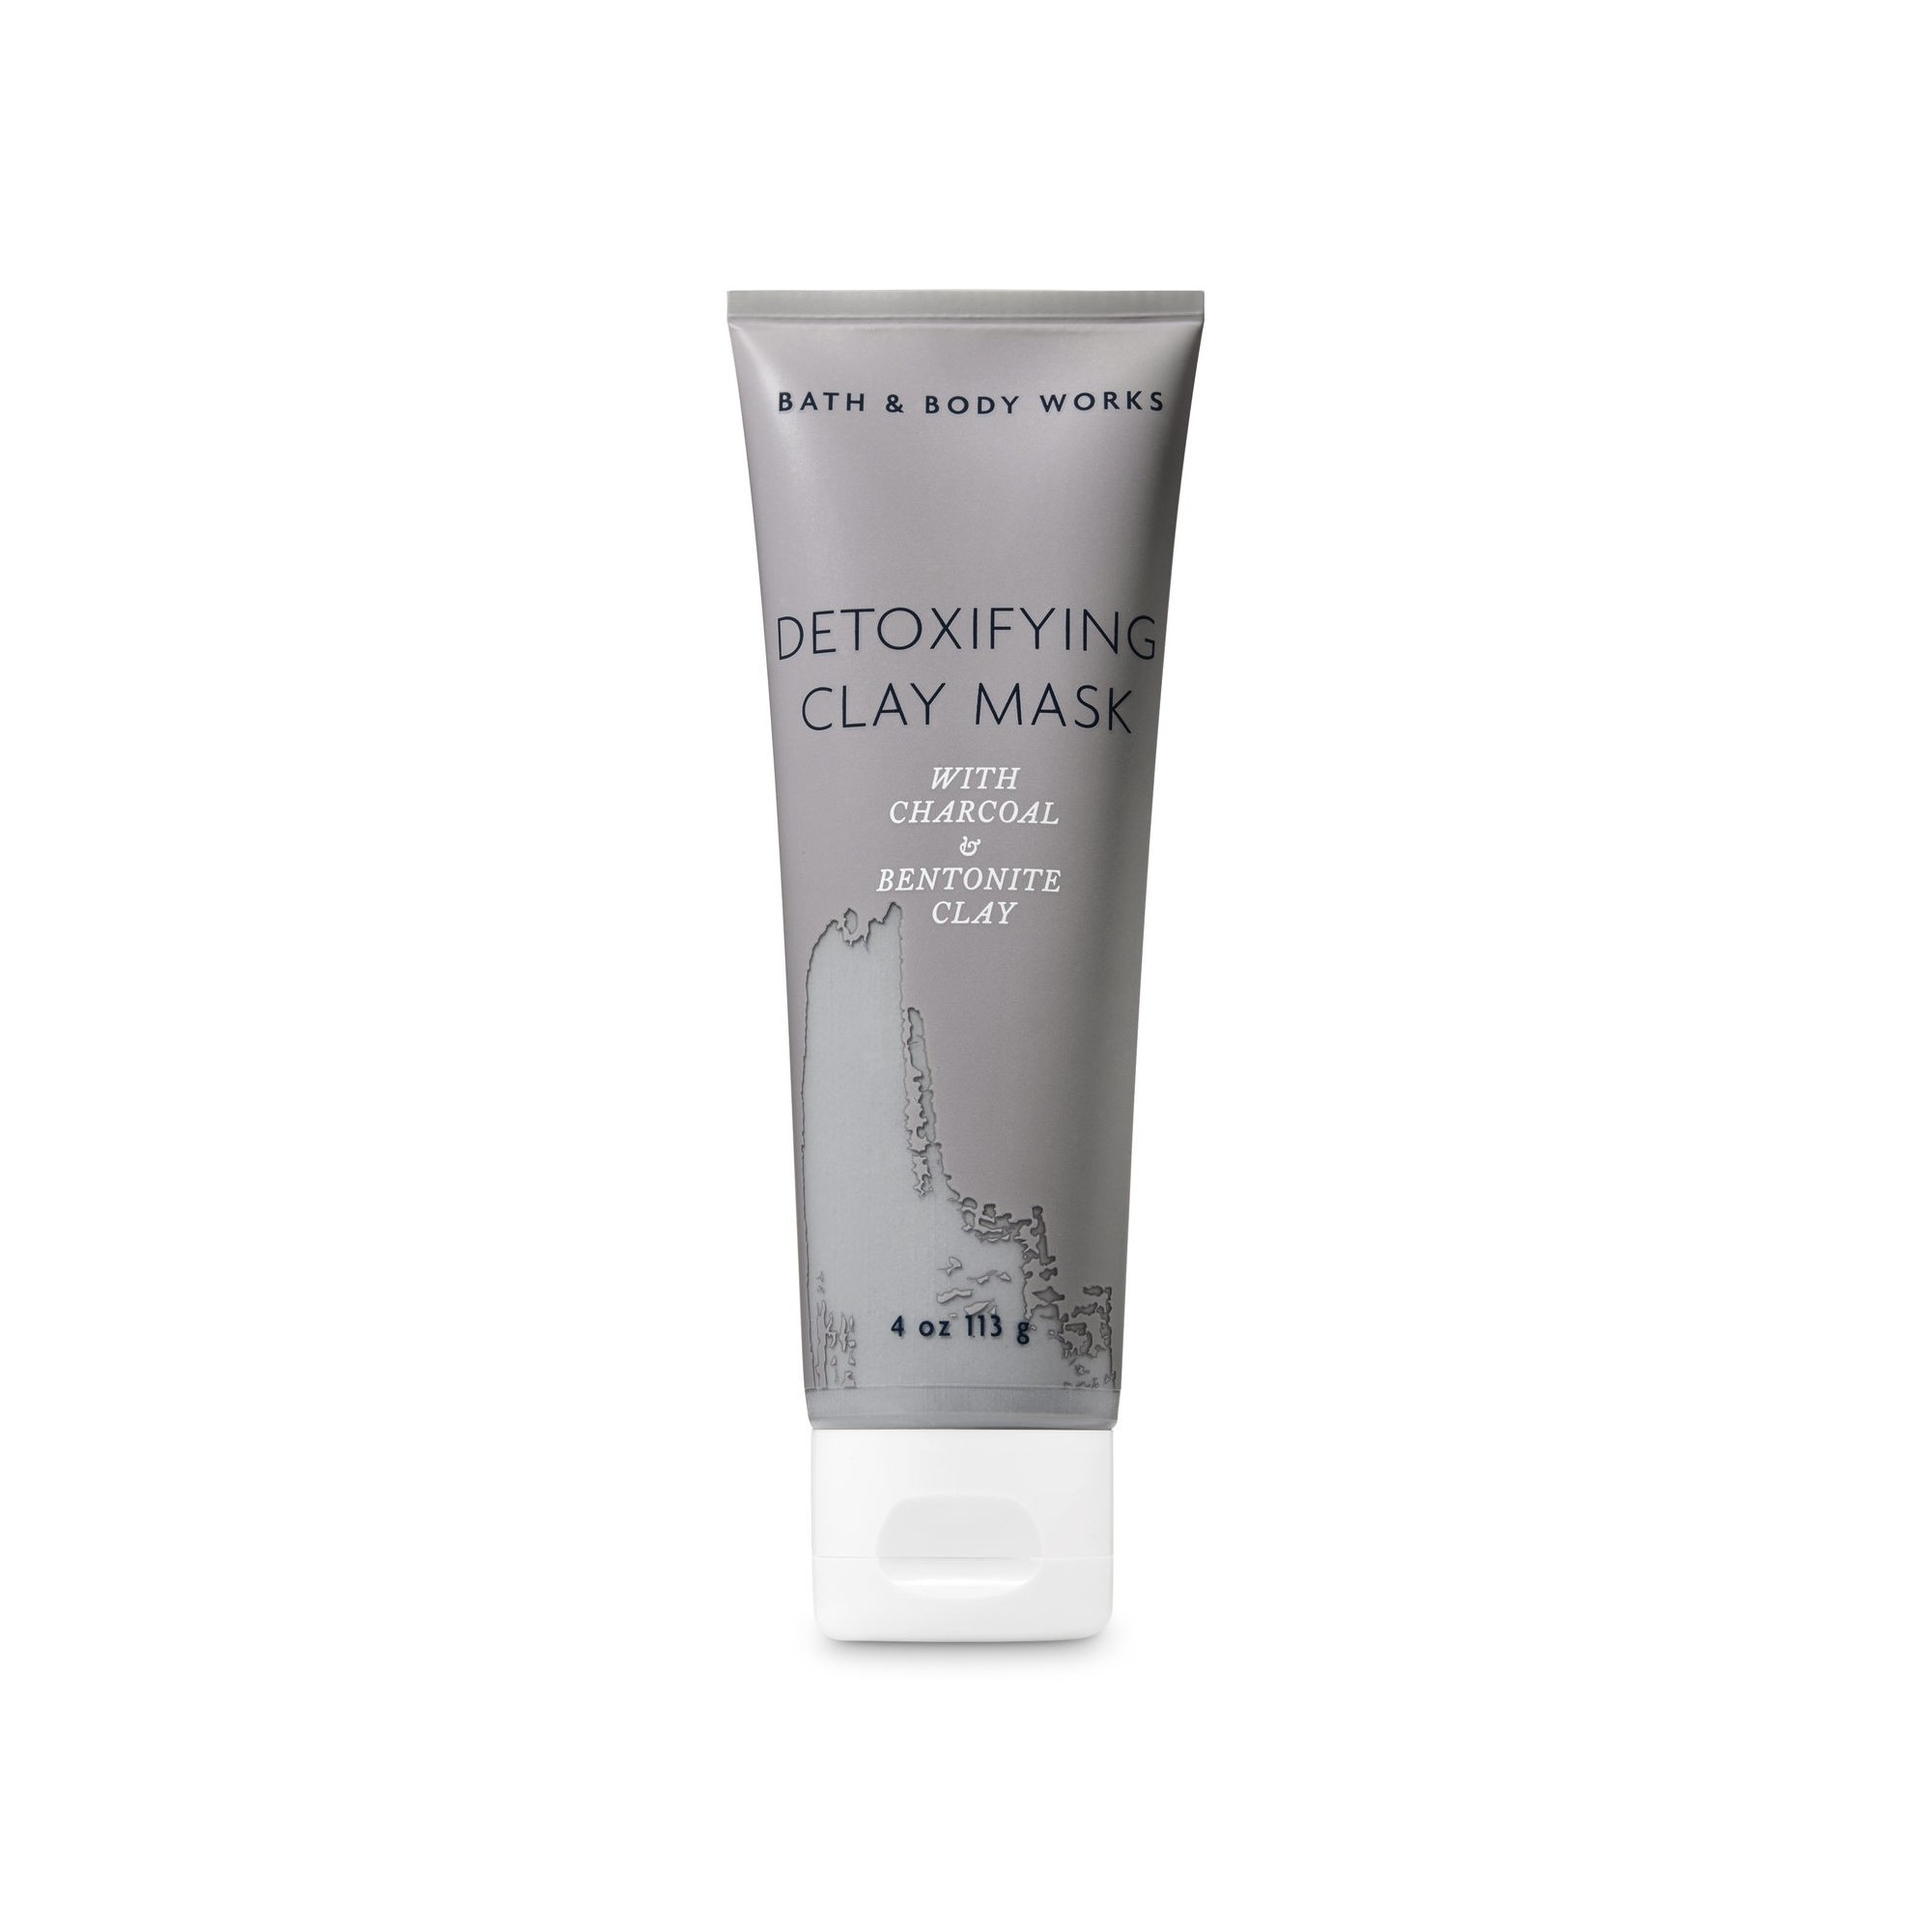 Bath & Body Works Detoxifying Charcoal & Bentonite Clay Mask